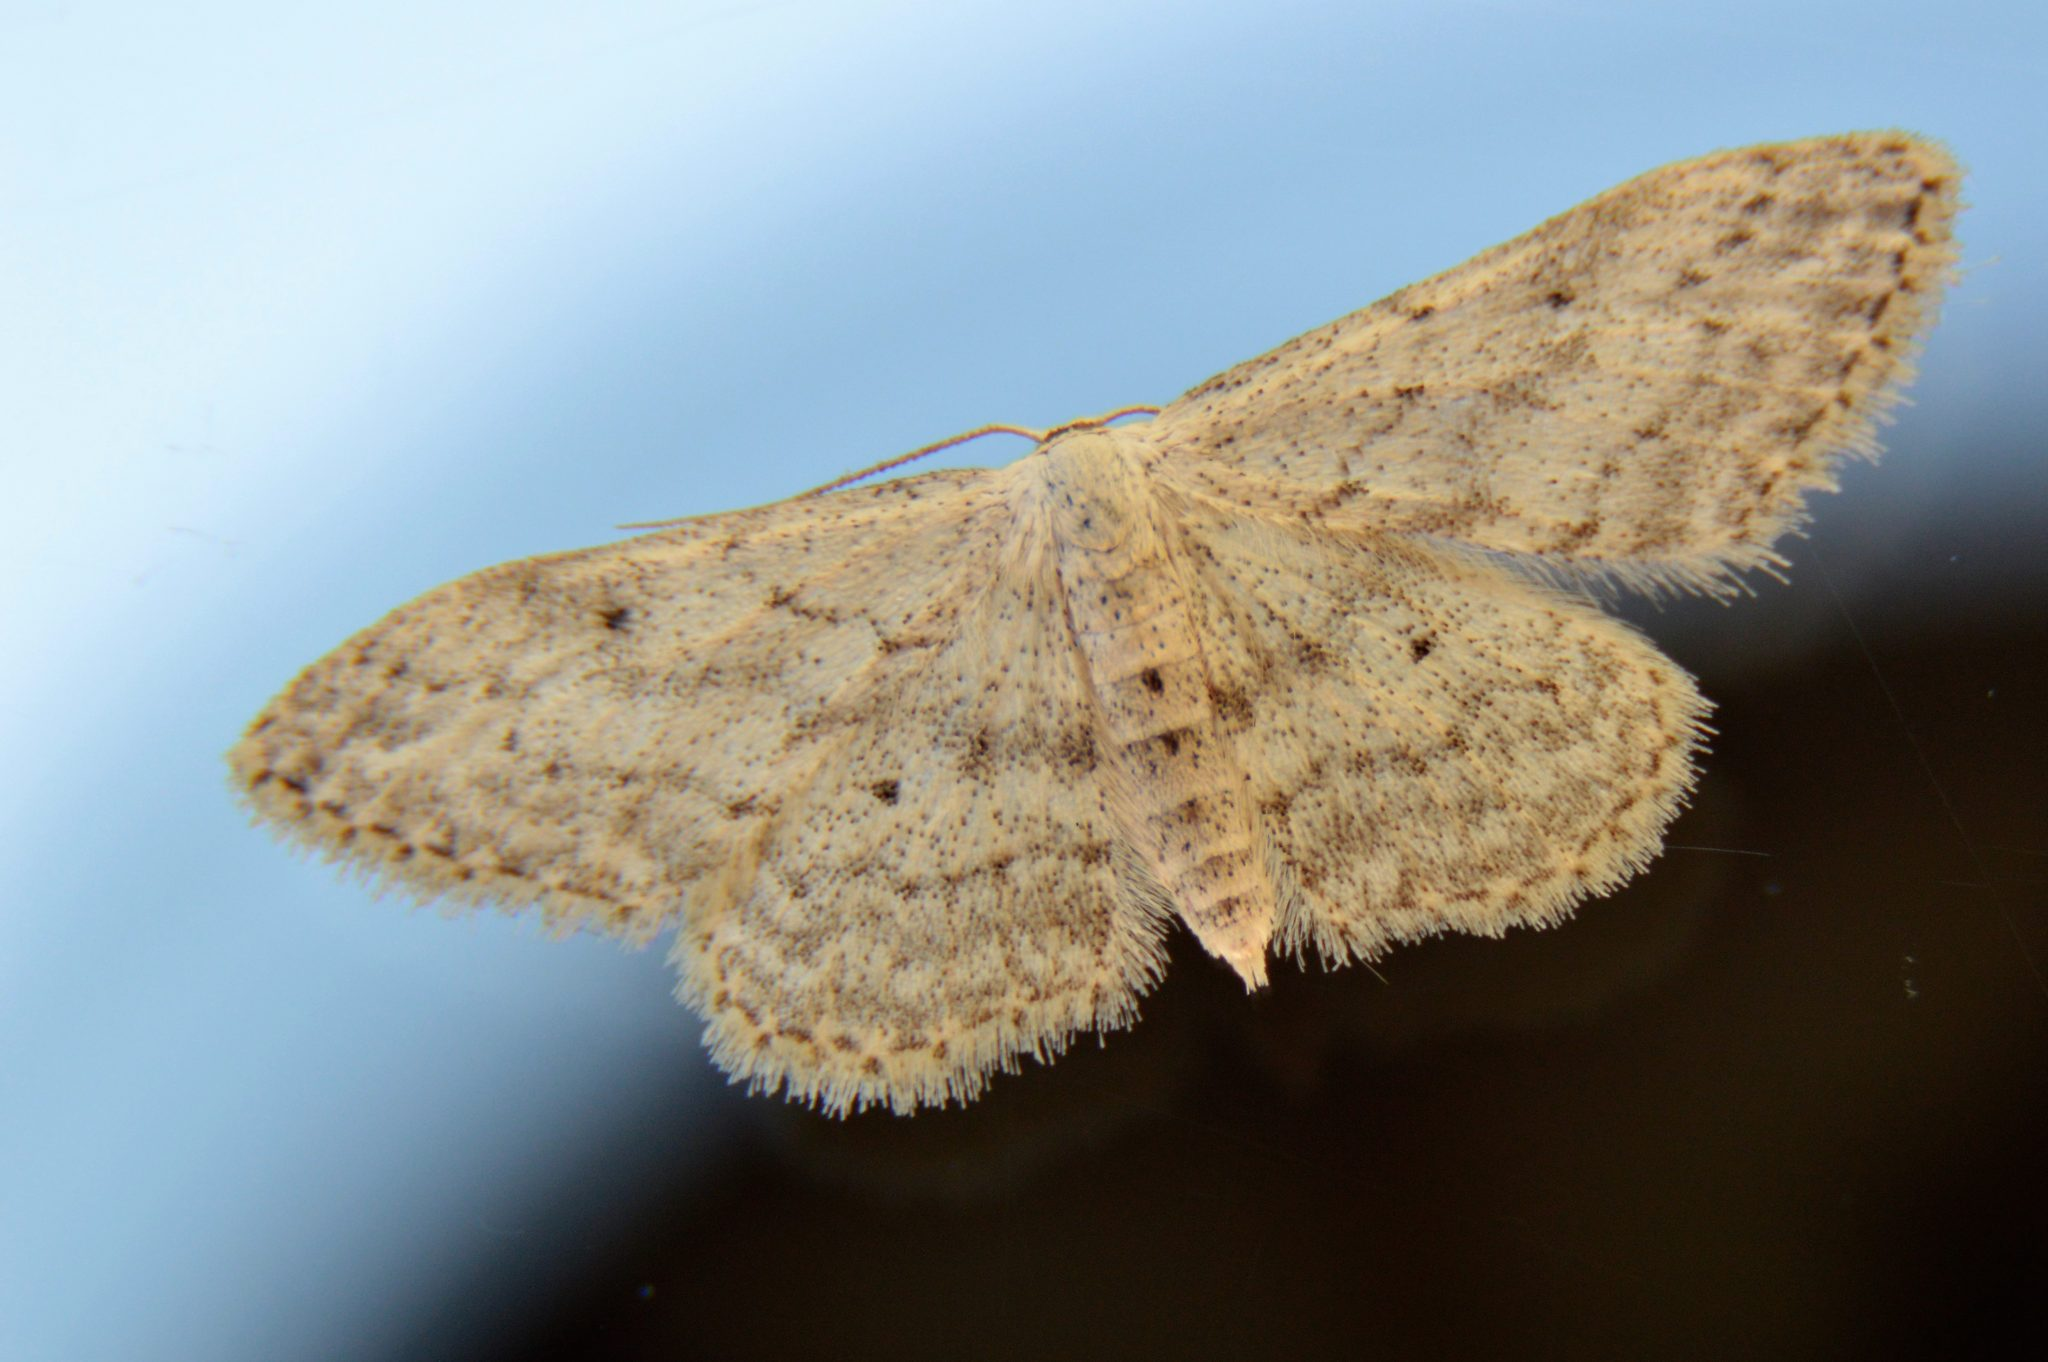 Macrofotografie nachtvlinder